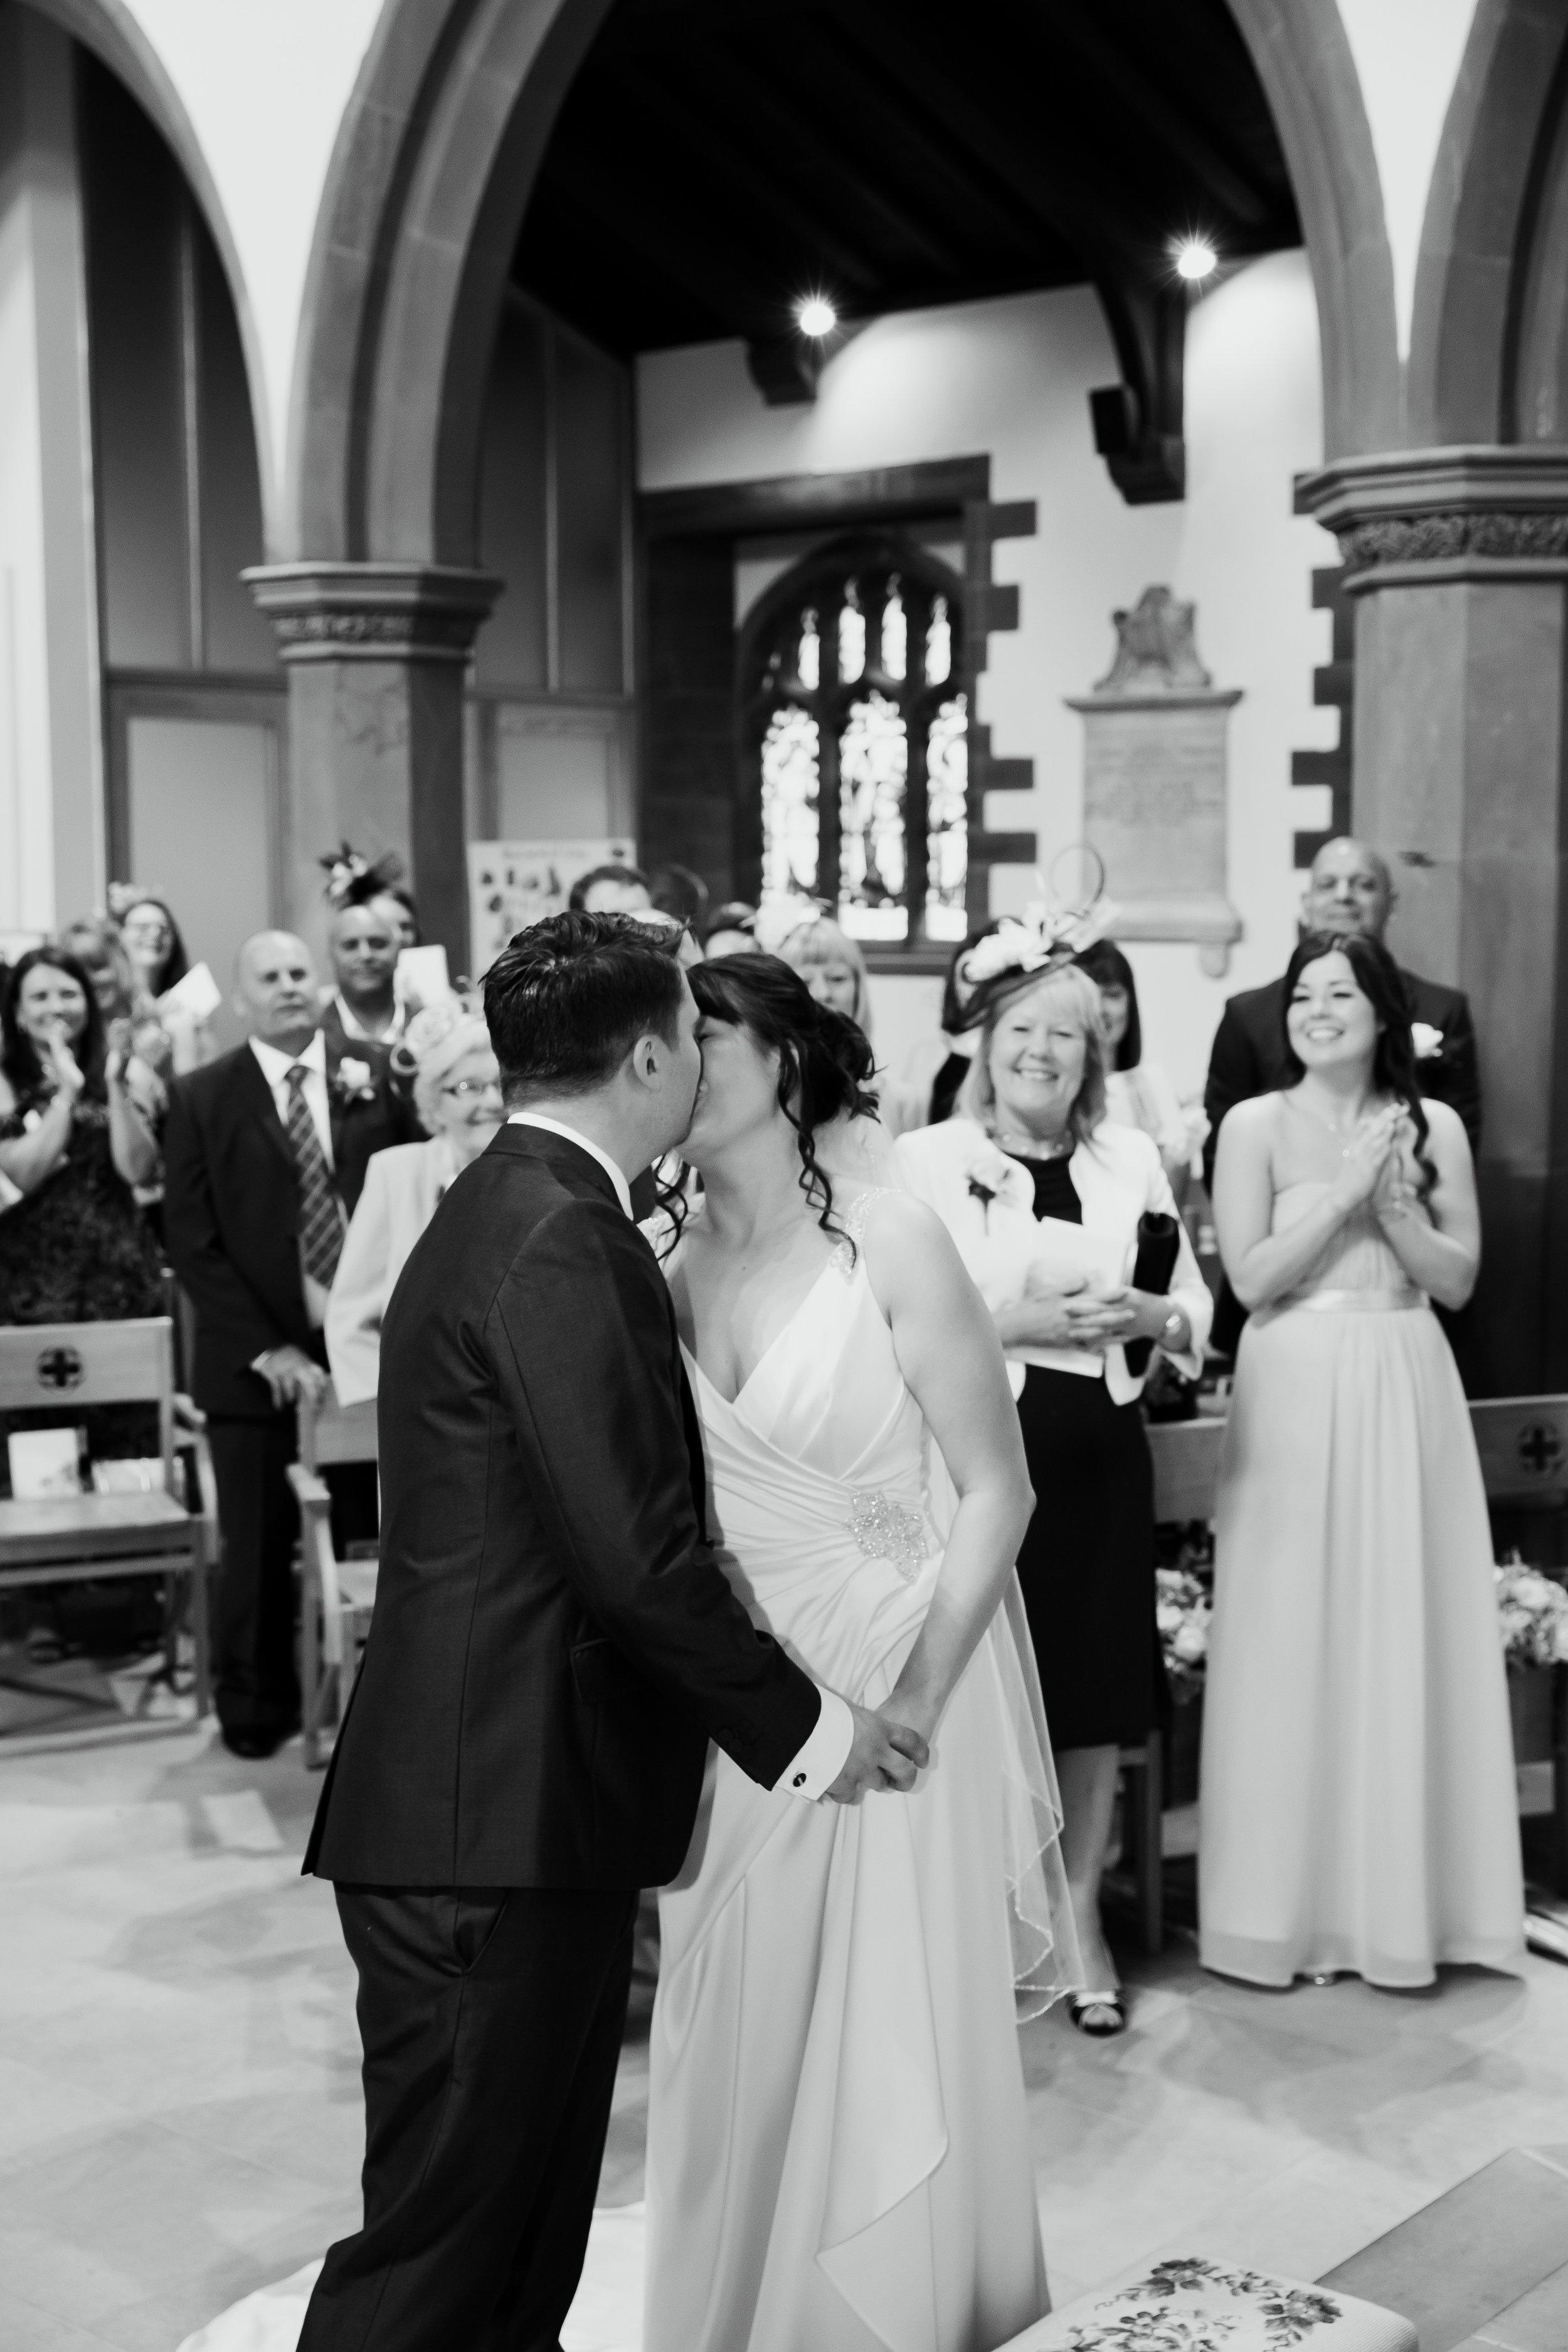 Wedding Kiss bride and groom